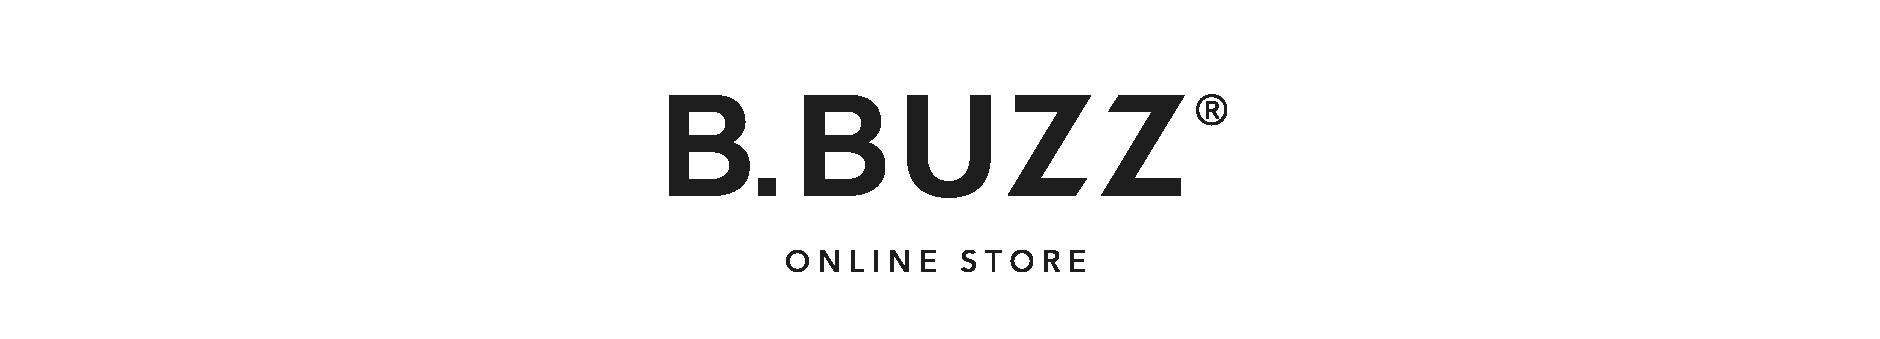 B.BUZZ ONLINE STORE